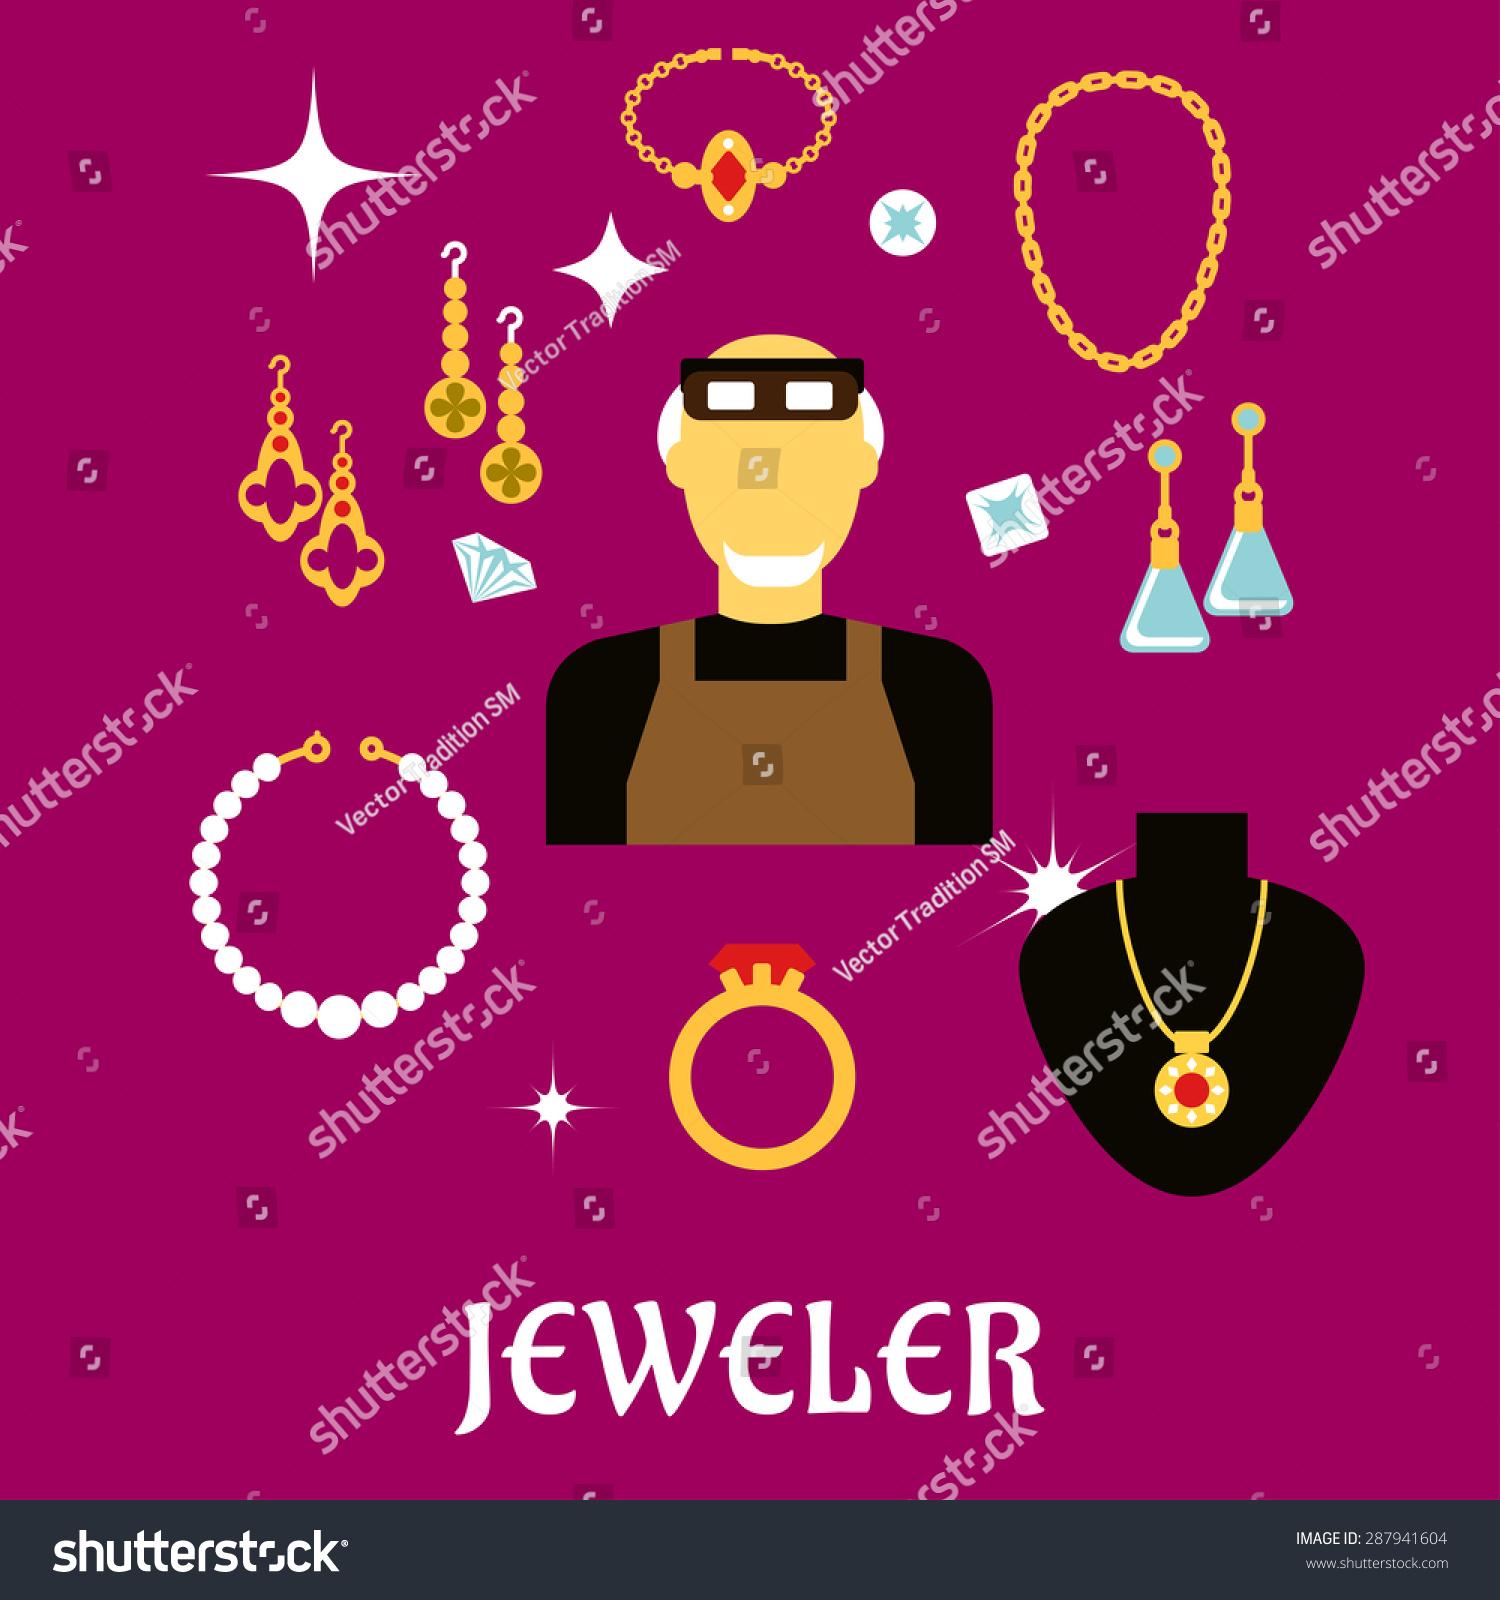 Jeweler Goldsmith Profession Concept Design Man Stock Vector (2018 ...